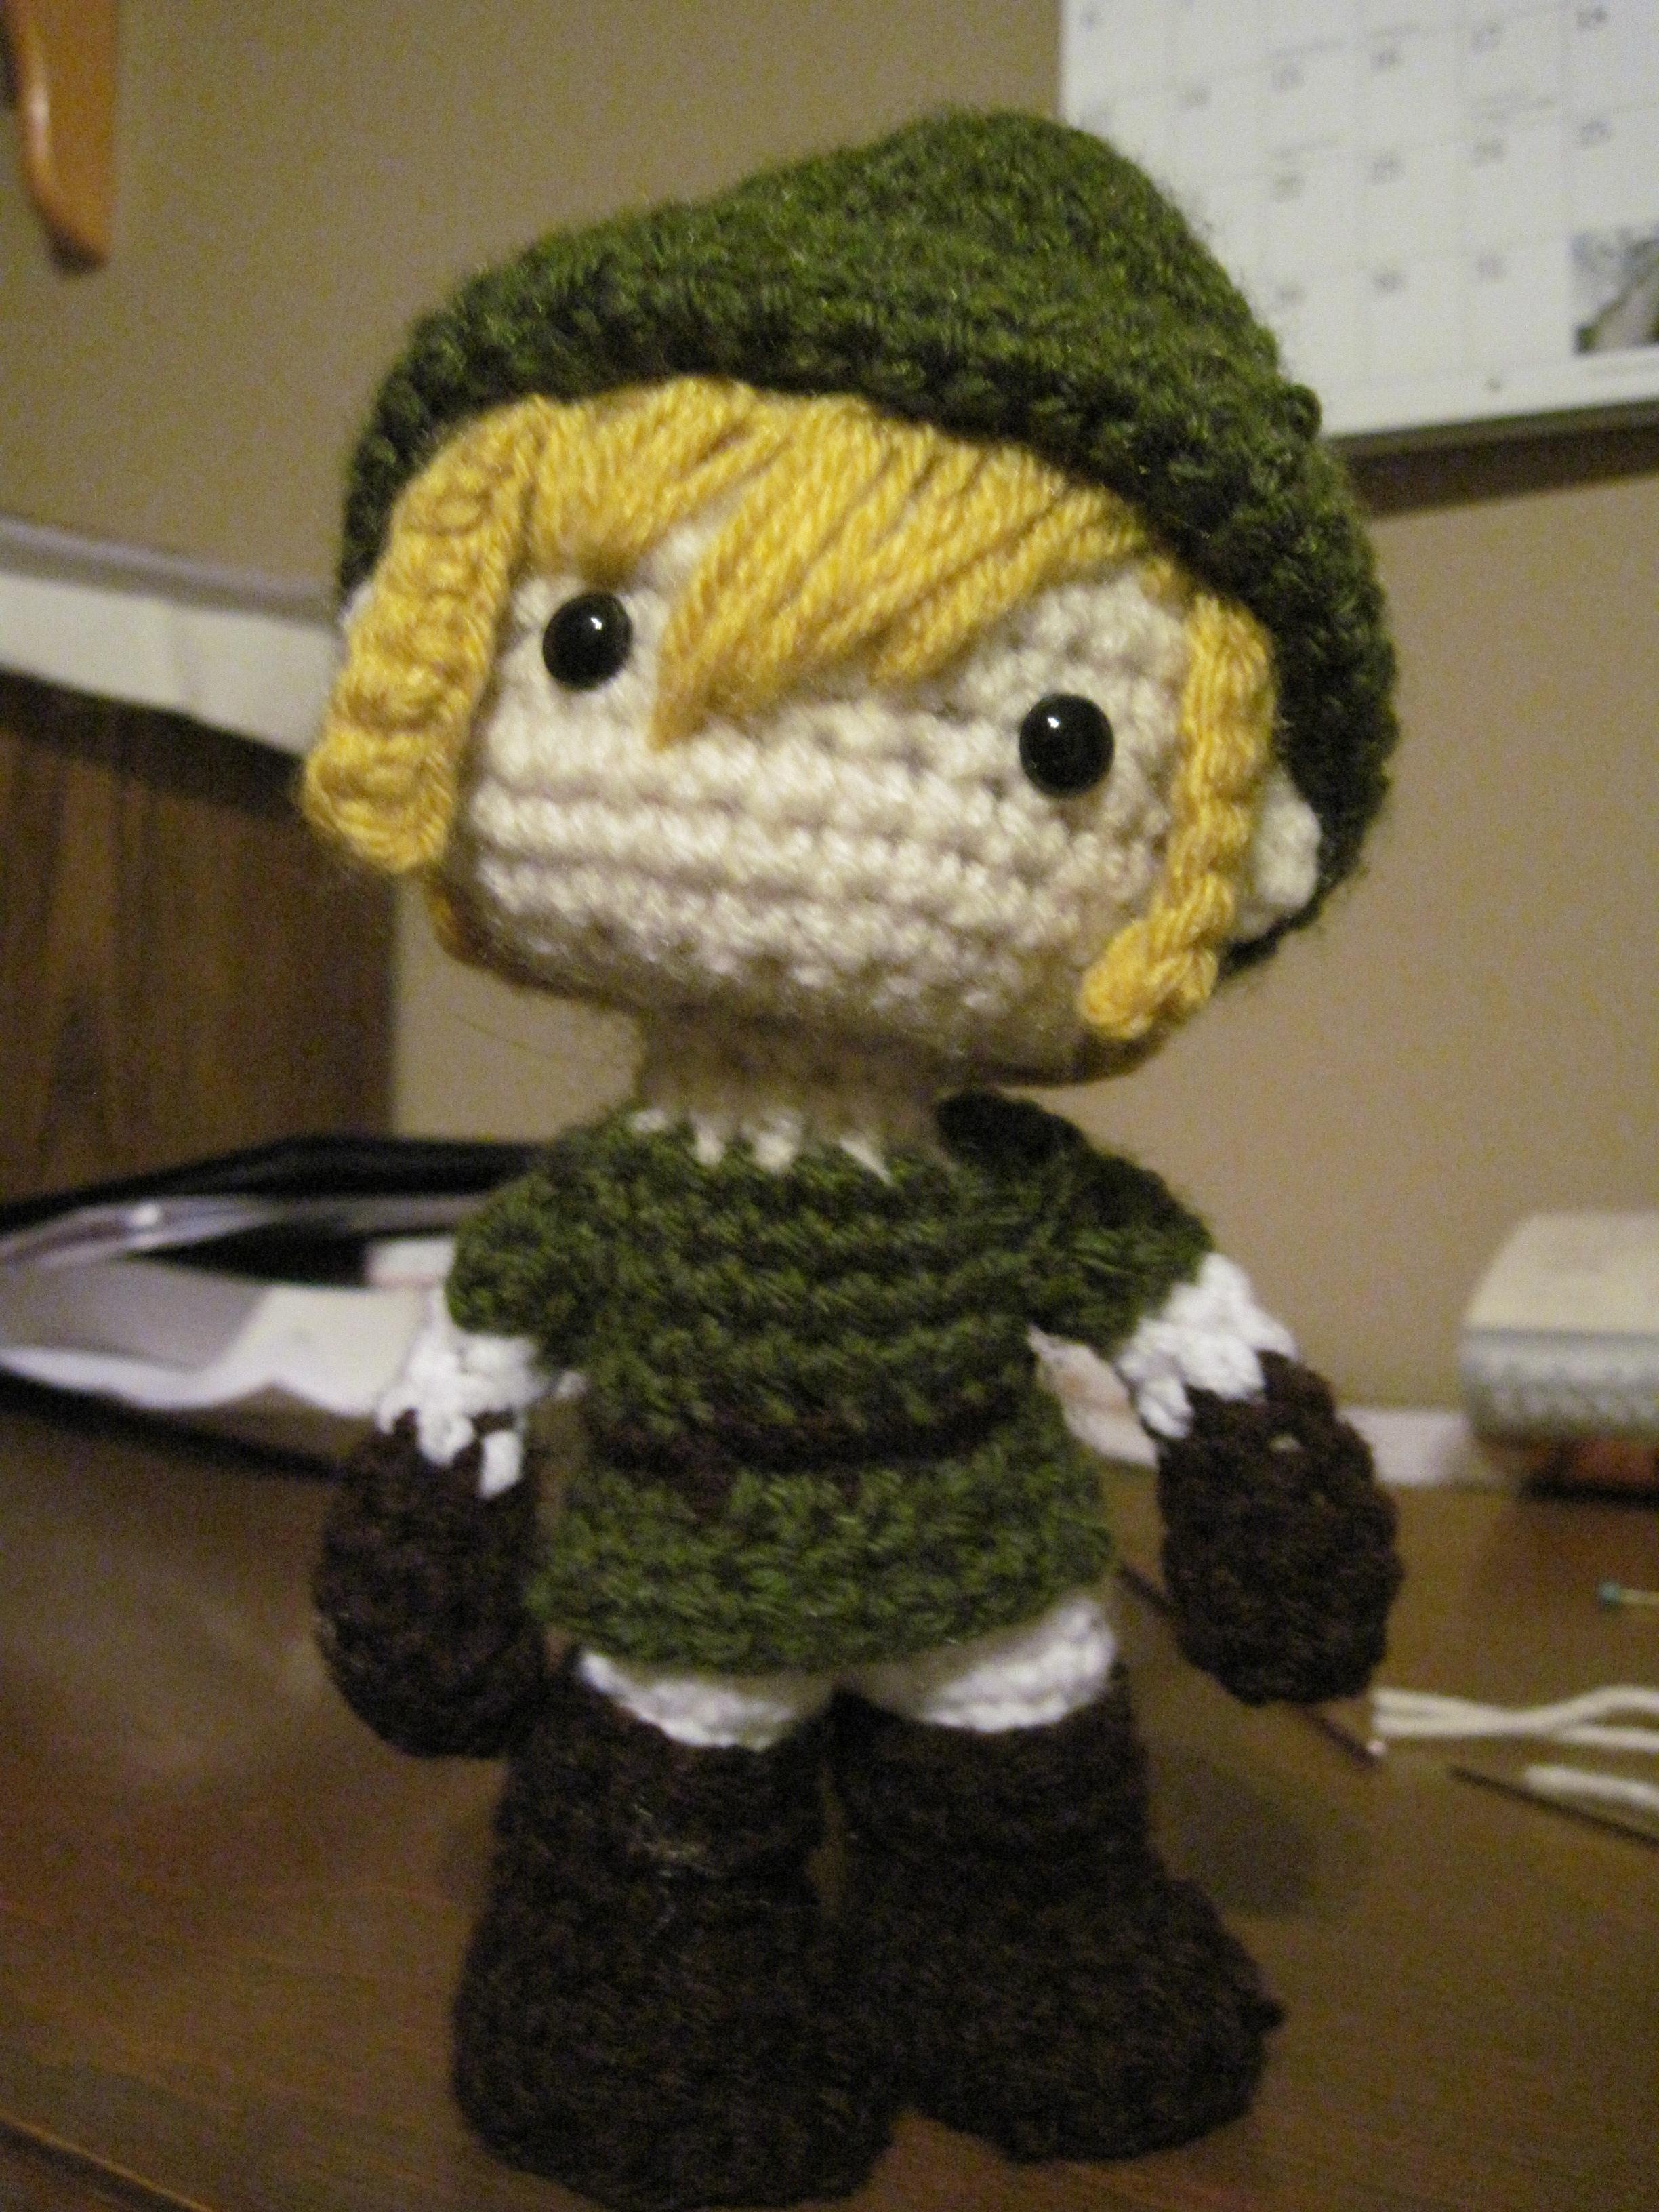 Crocheted Link Amigurumi by kichihayashi on DeviantArt